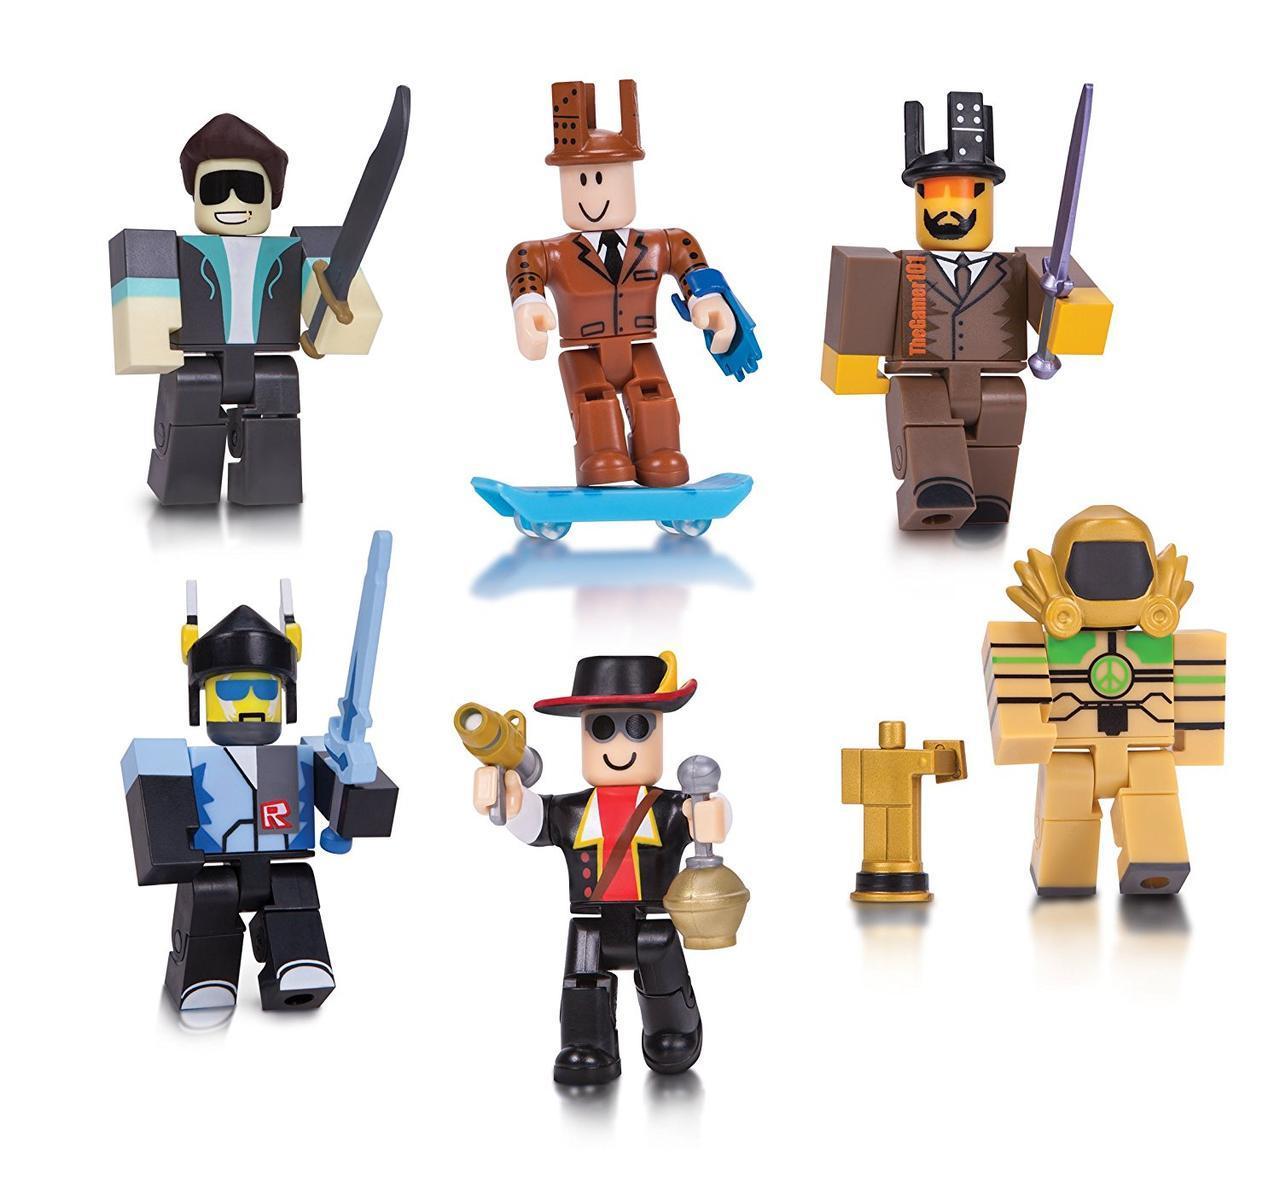 Фигурки роблокс Roblox Legends of Roblox Six Figure Pack